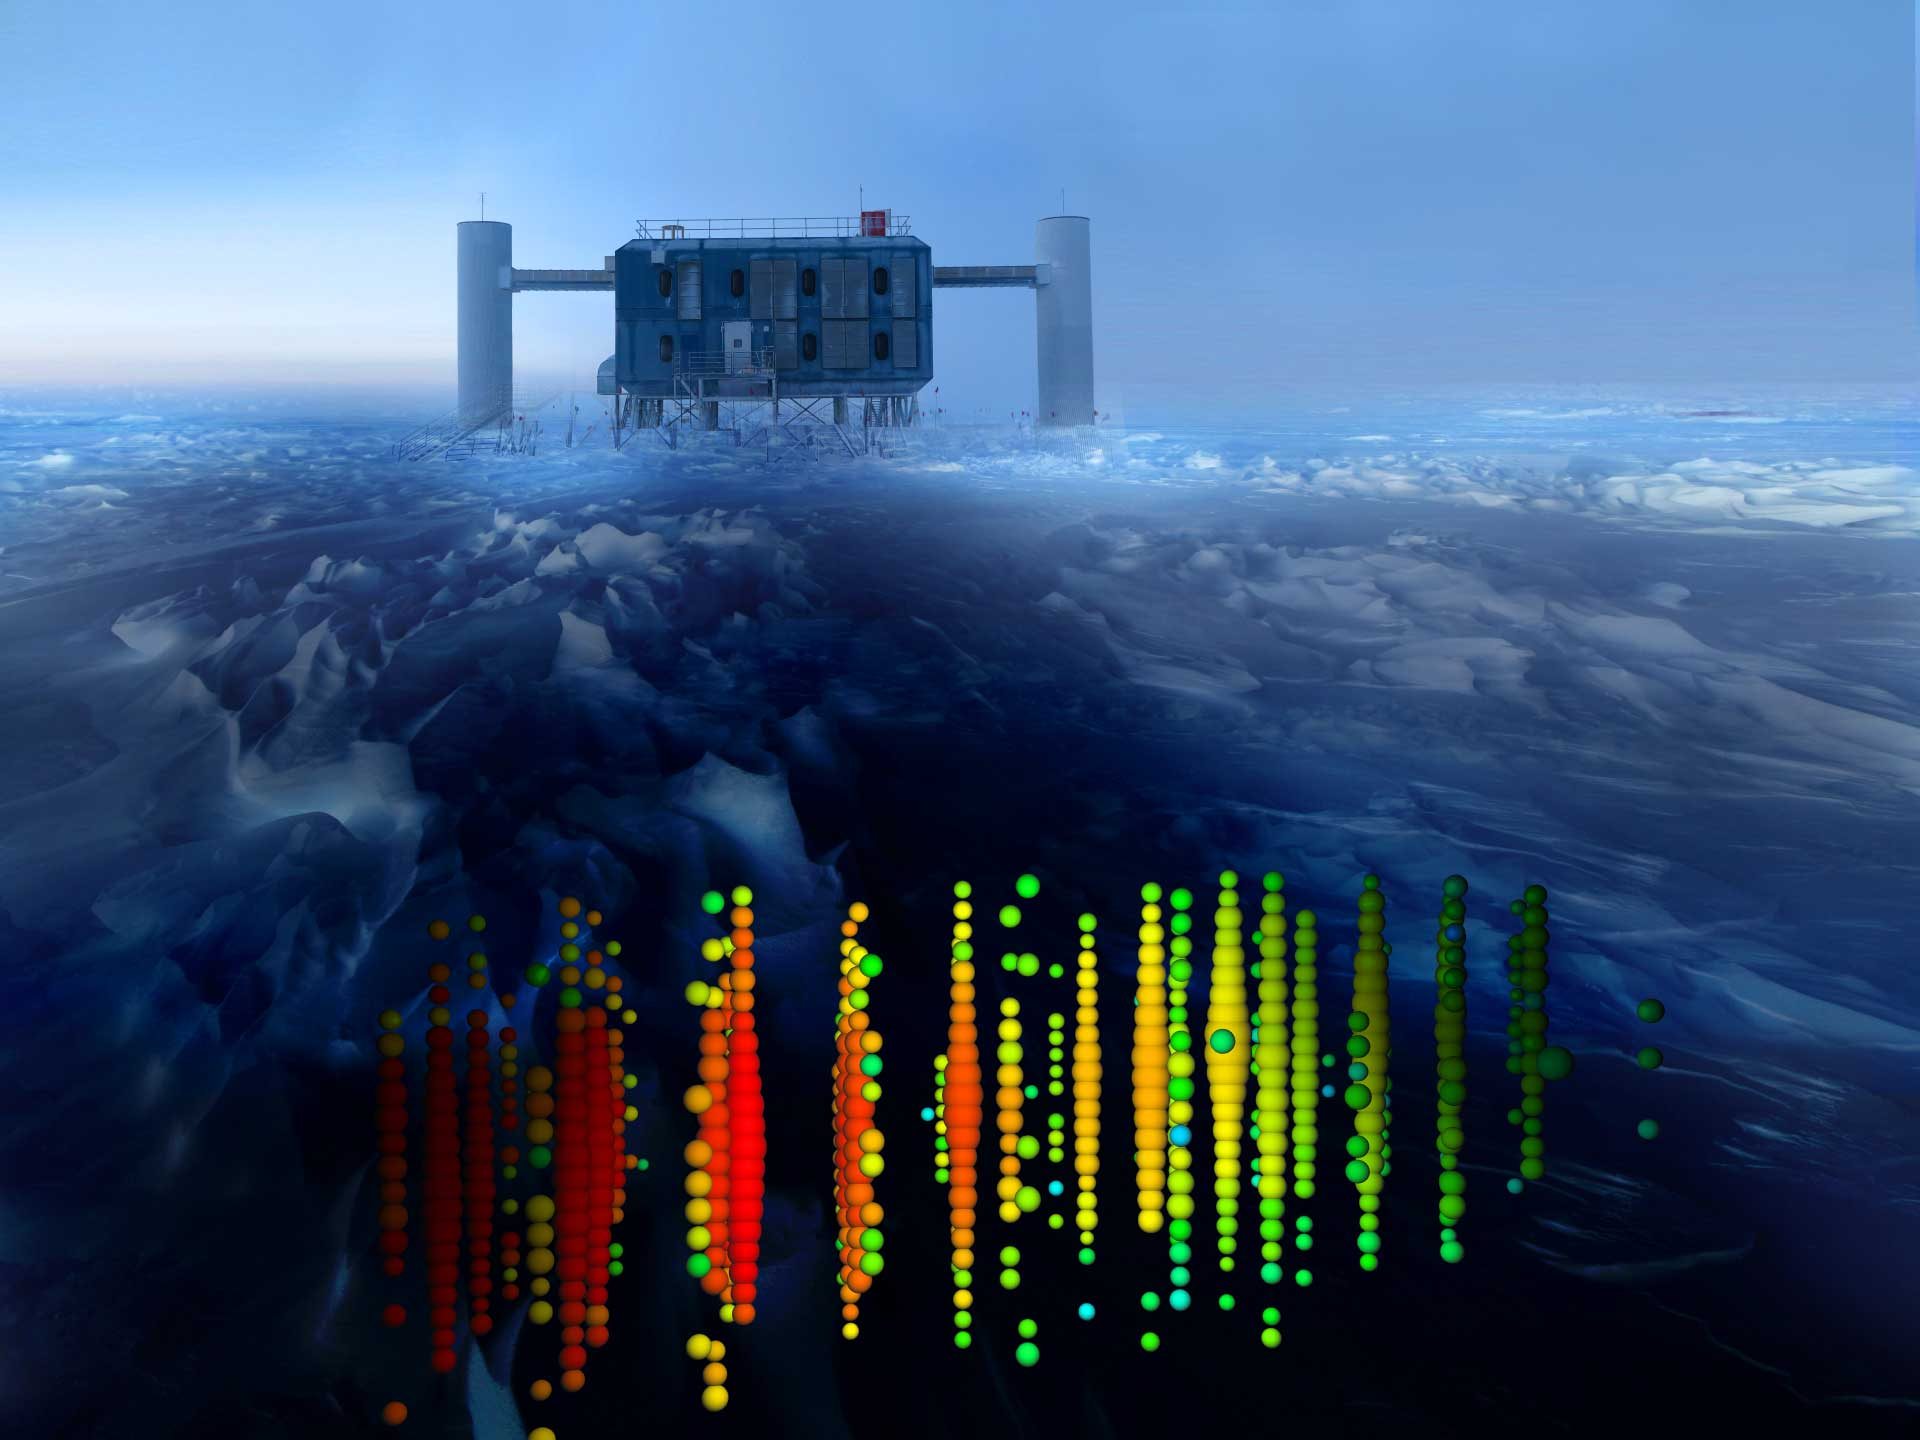 Where are the IceCube neutrinos coming from? | astrobitesIcecube Neutrino Observatory Core